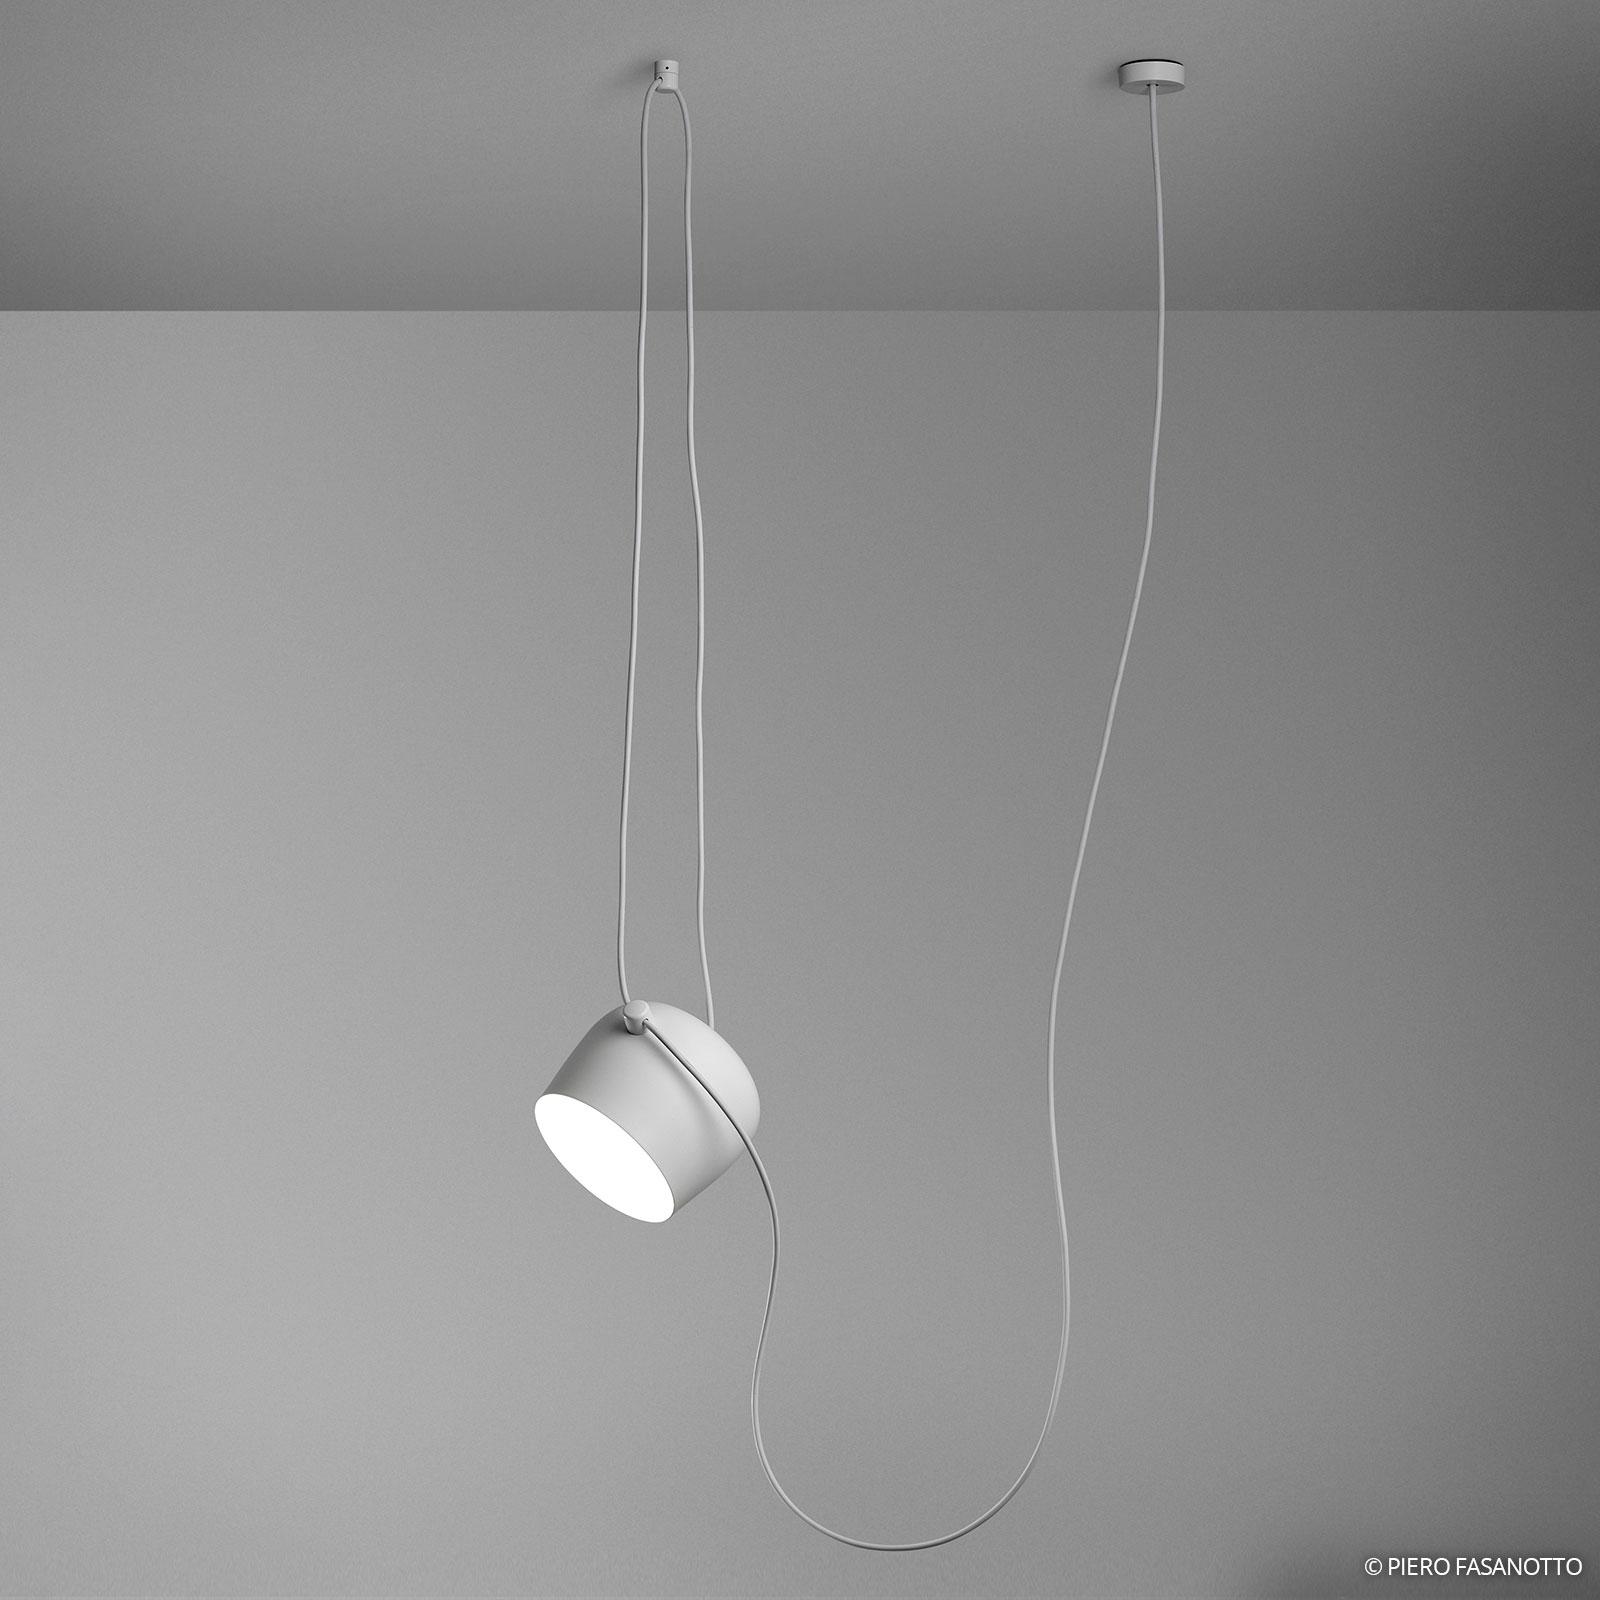 Lampada a sospensione LED Aim bianca